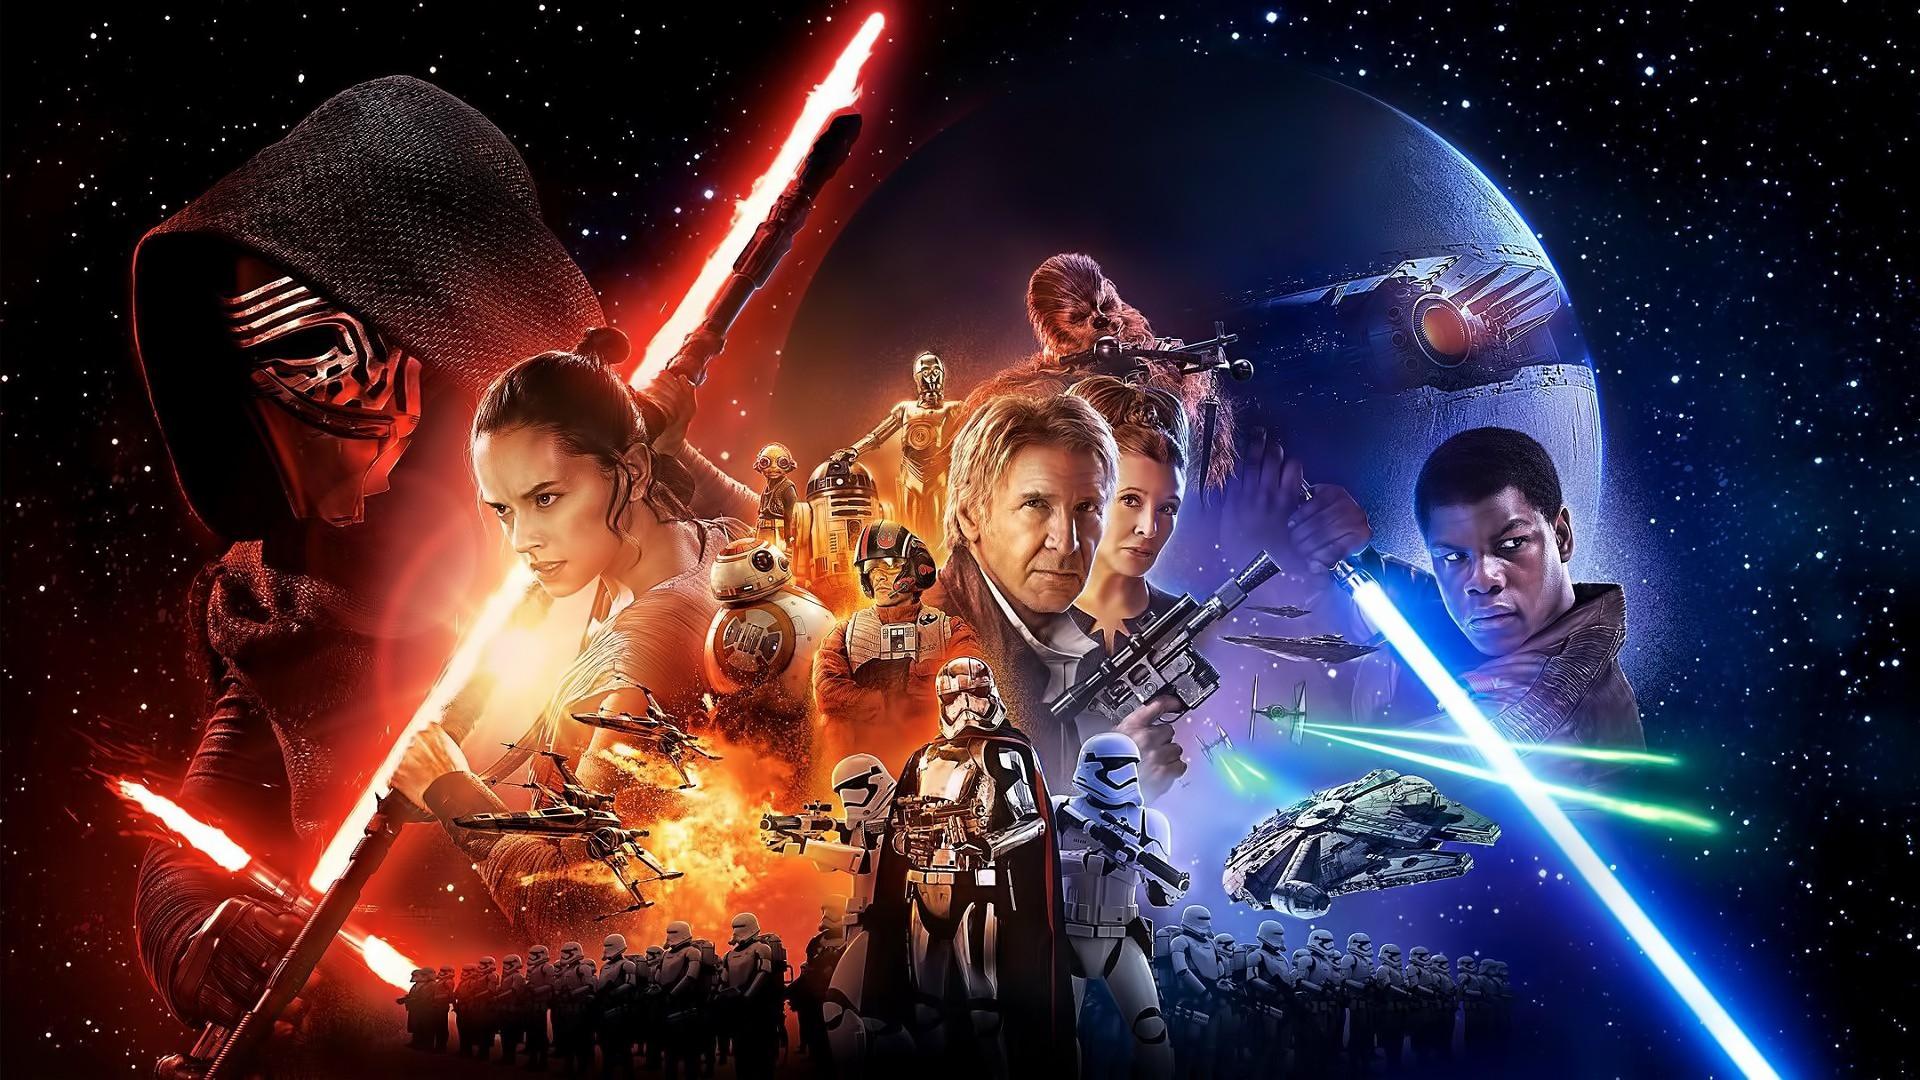 General 1920x1080 Kylo Ren Captain Phasma Phasma Rey Star Wars: The Force Awakens lightsaber Star Wars Jedi Sith Millennium Falcon science fiction Chewbacca Han Solo